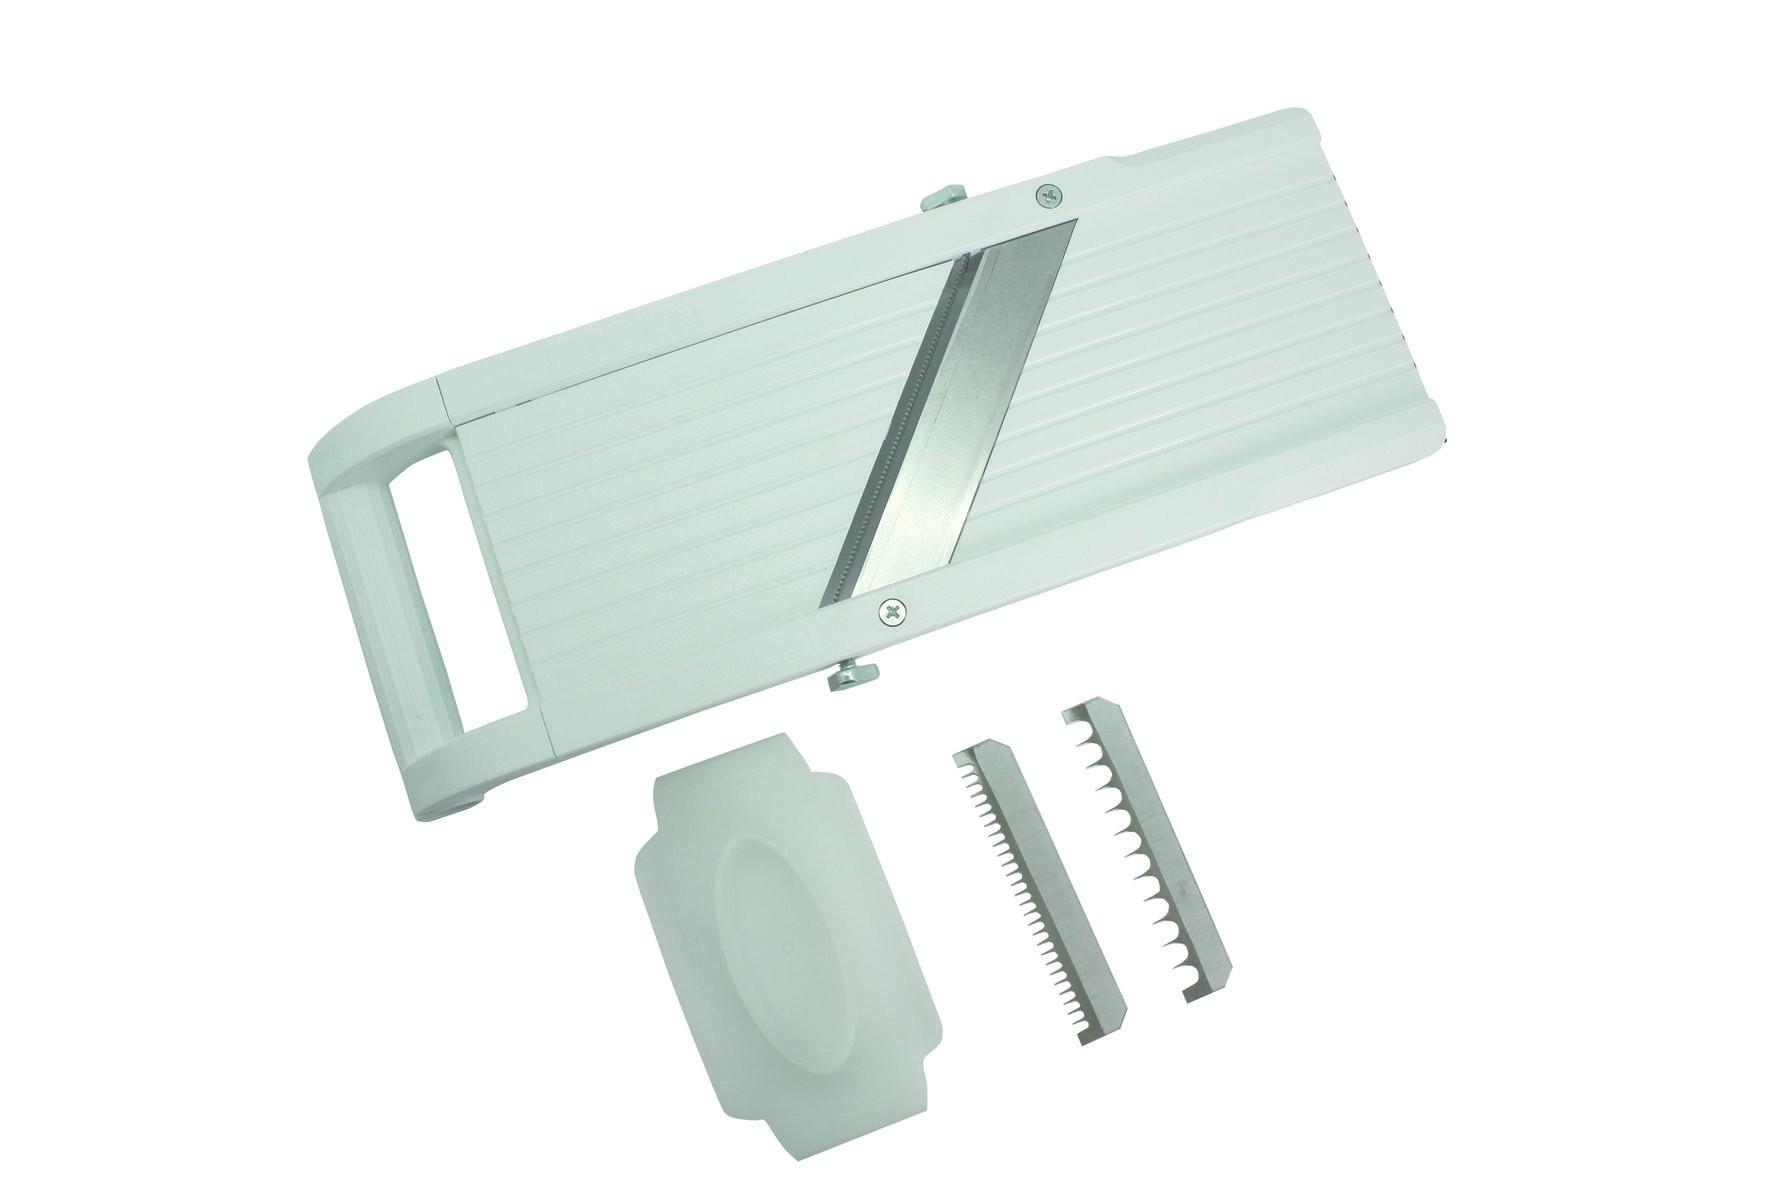 Benriner Jumbo Slicer with Single Flat Adjustable Blade ...